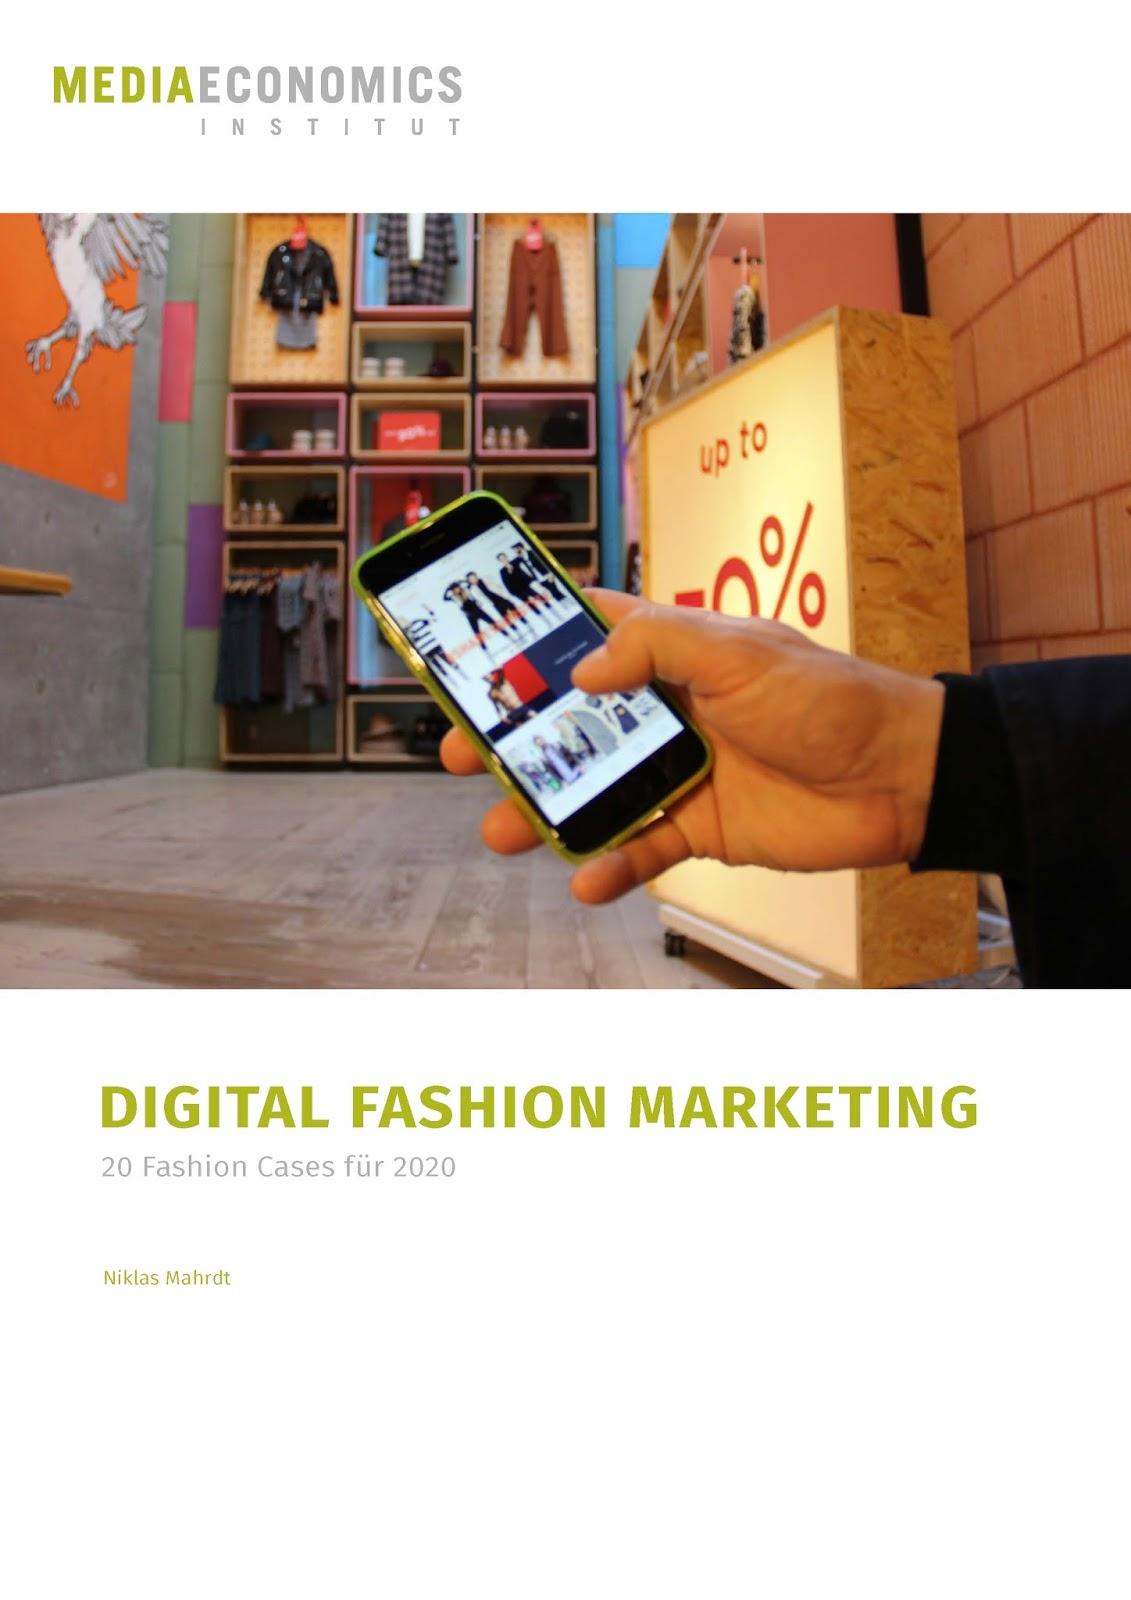 Cover_Digital_Fashion_Marketing__Niklas Mahrdt_Media_Economics_Institut